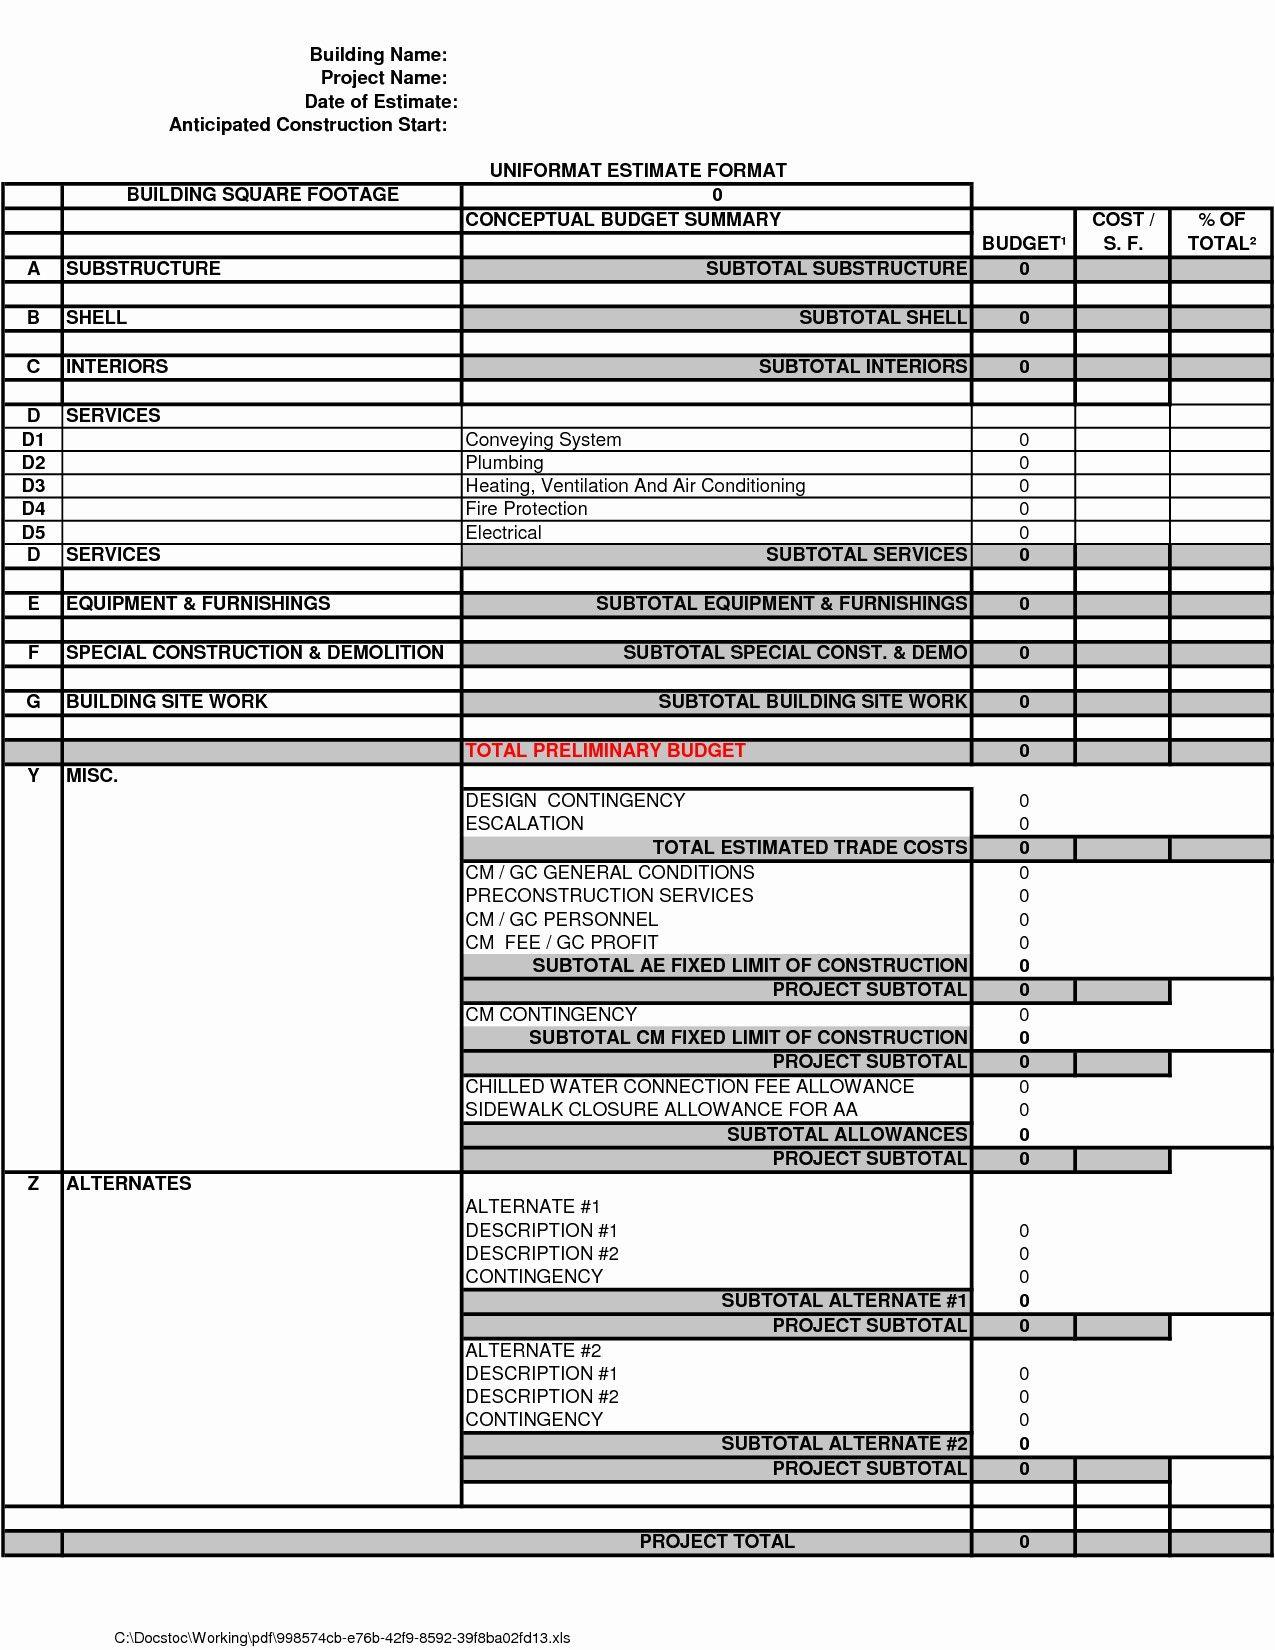 New Estimate Form Xls Xlsformat Xlstemplates Xlstemplate